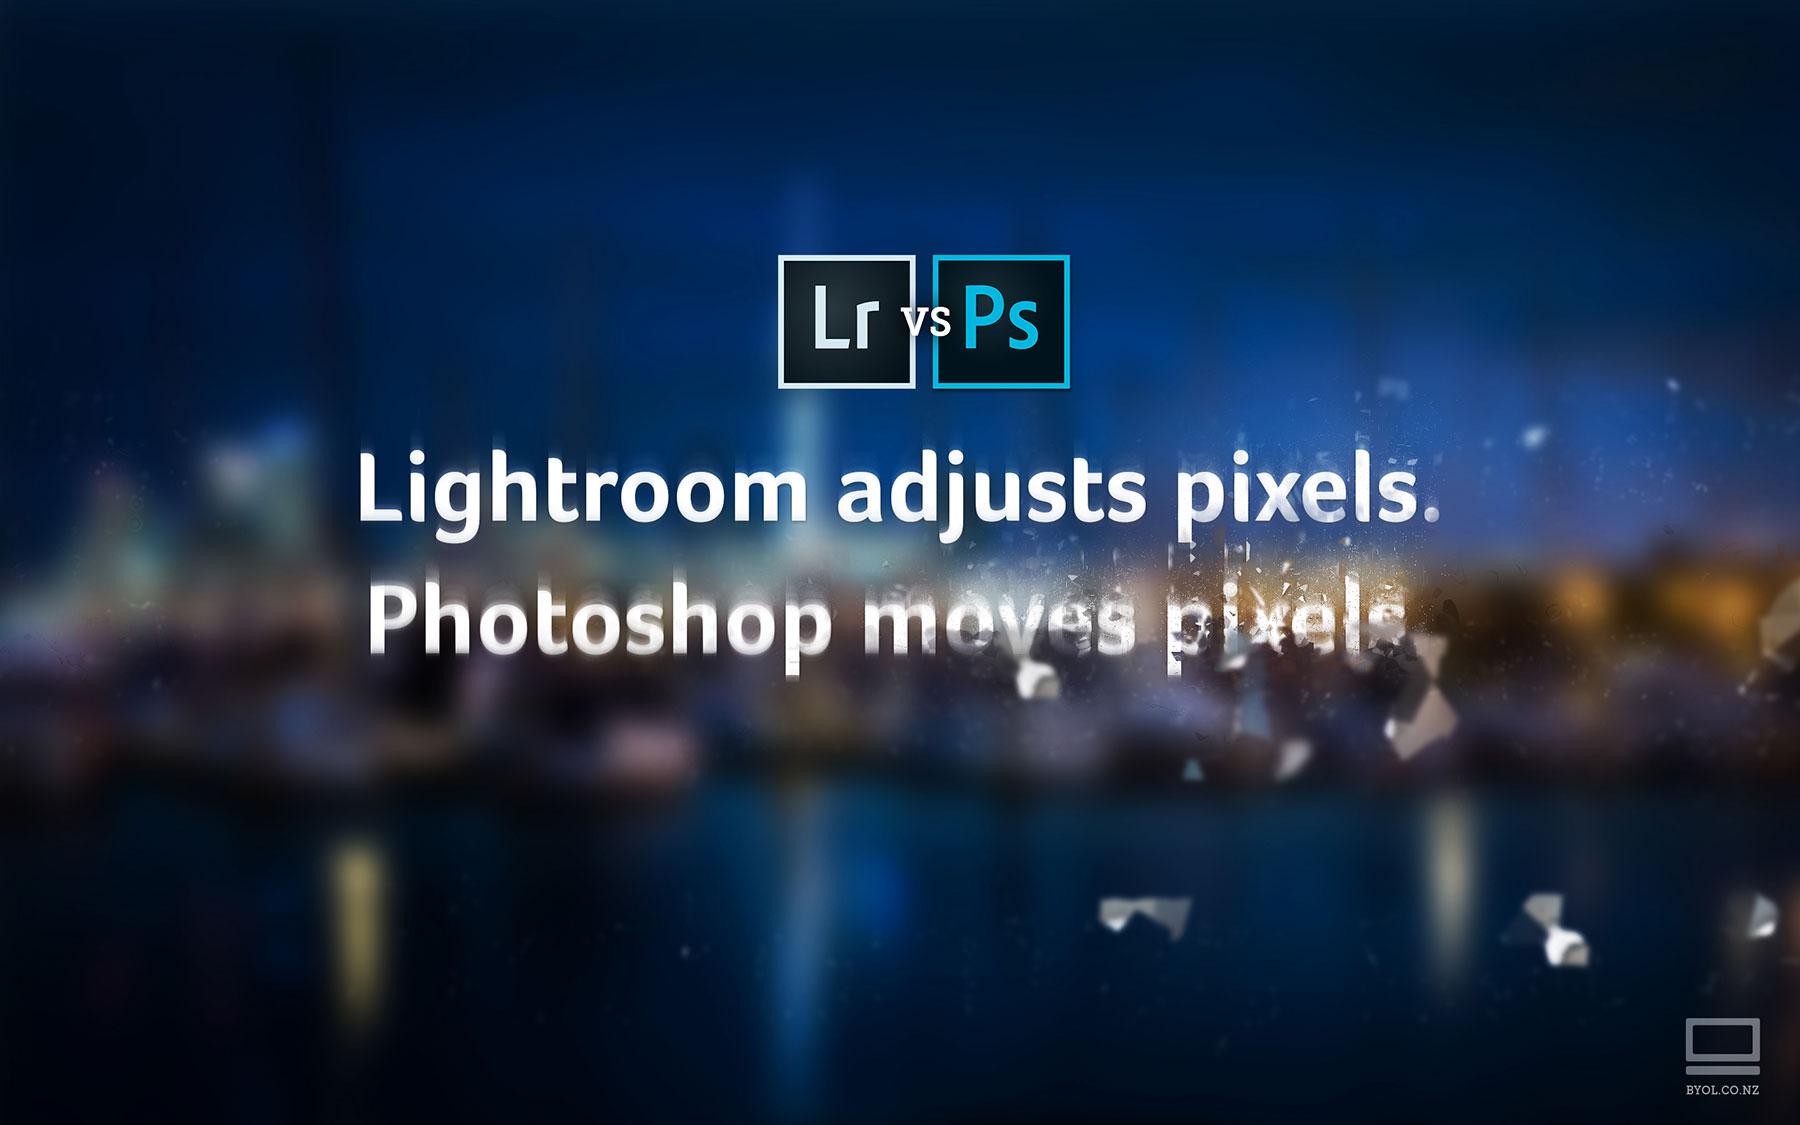 Photographers quandary   Lightroom vs Photoshop [2880x1800 1800x1125